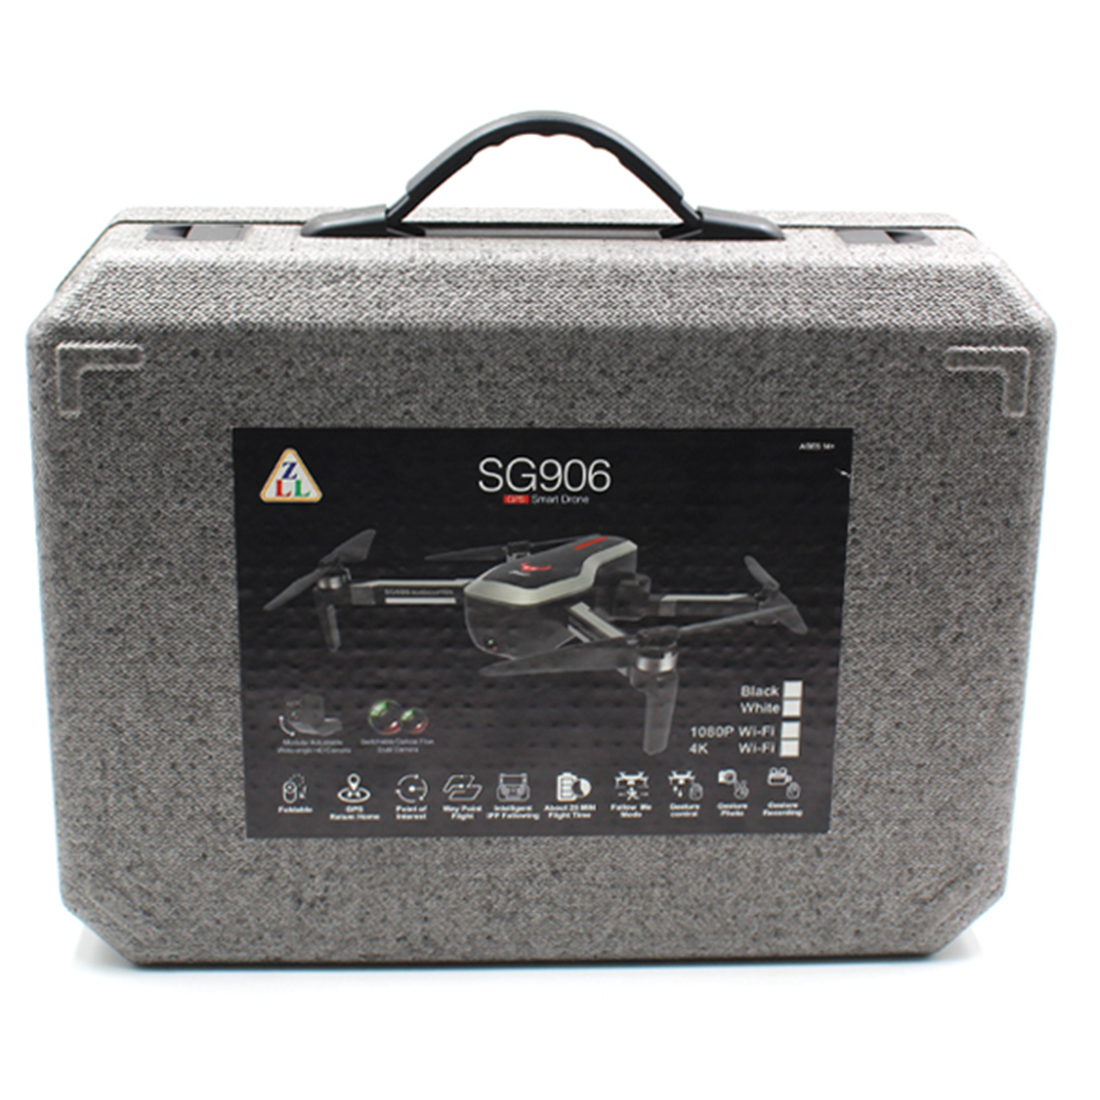 SG906 Handbag Easy Carring Box Storage Box Travel Portable RC Quadcopter Bag Suit For F11 B4W SG906 X193 Protective Storage Box